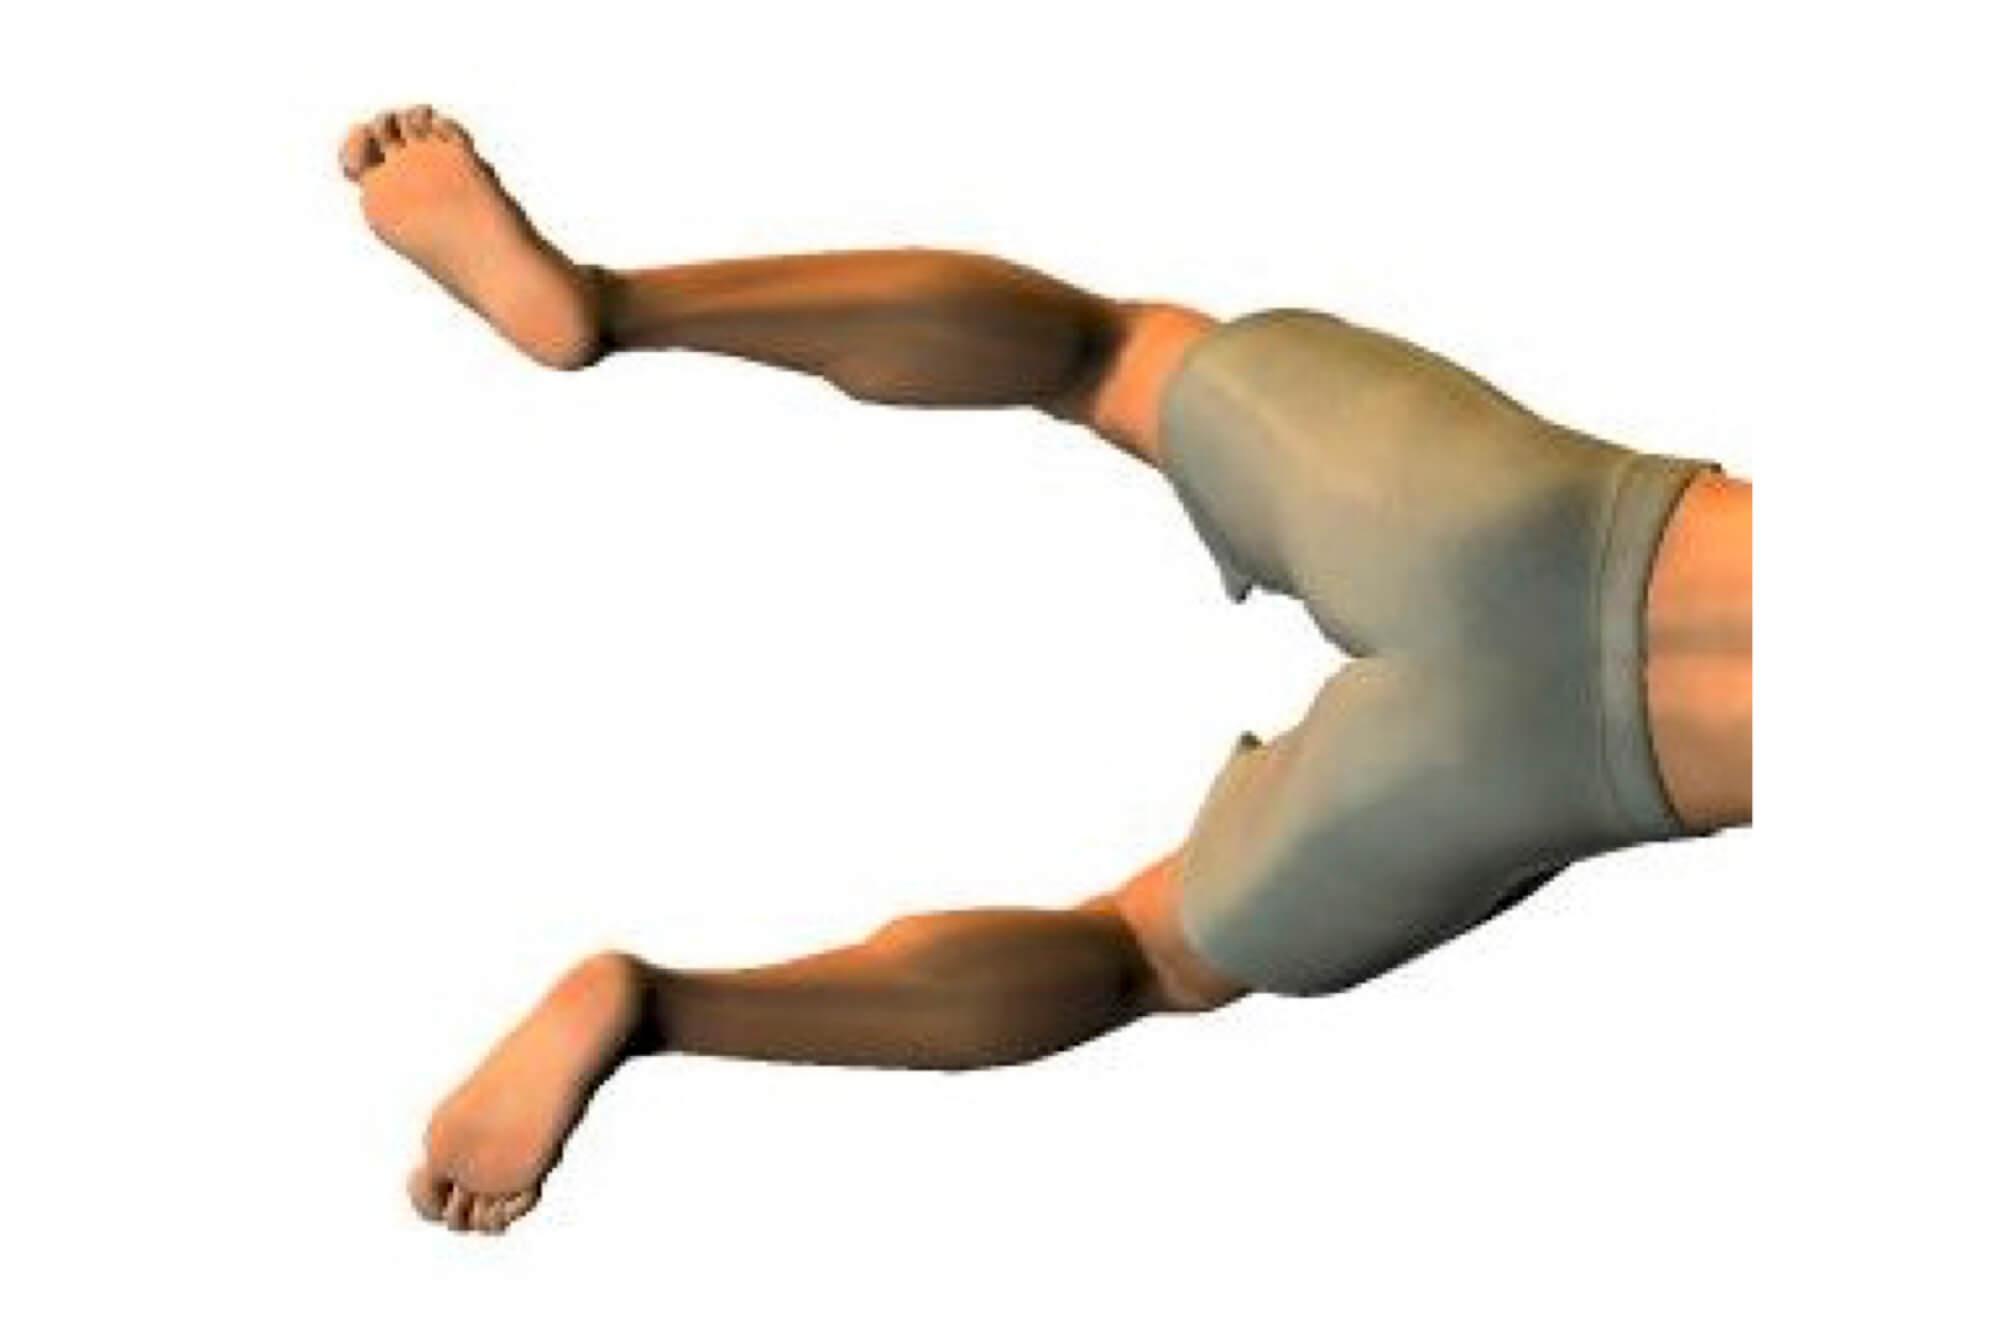 breaststroke leg kick